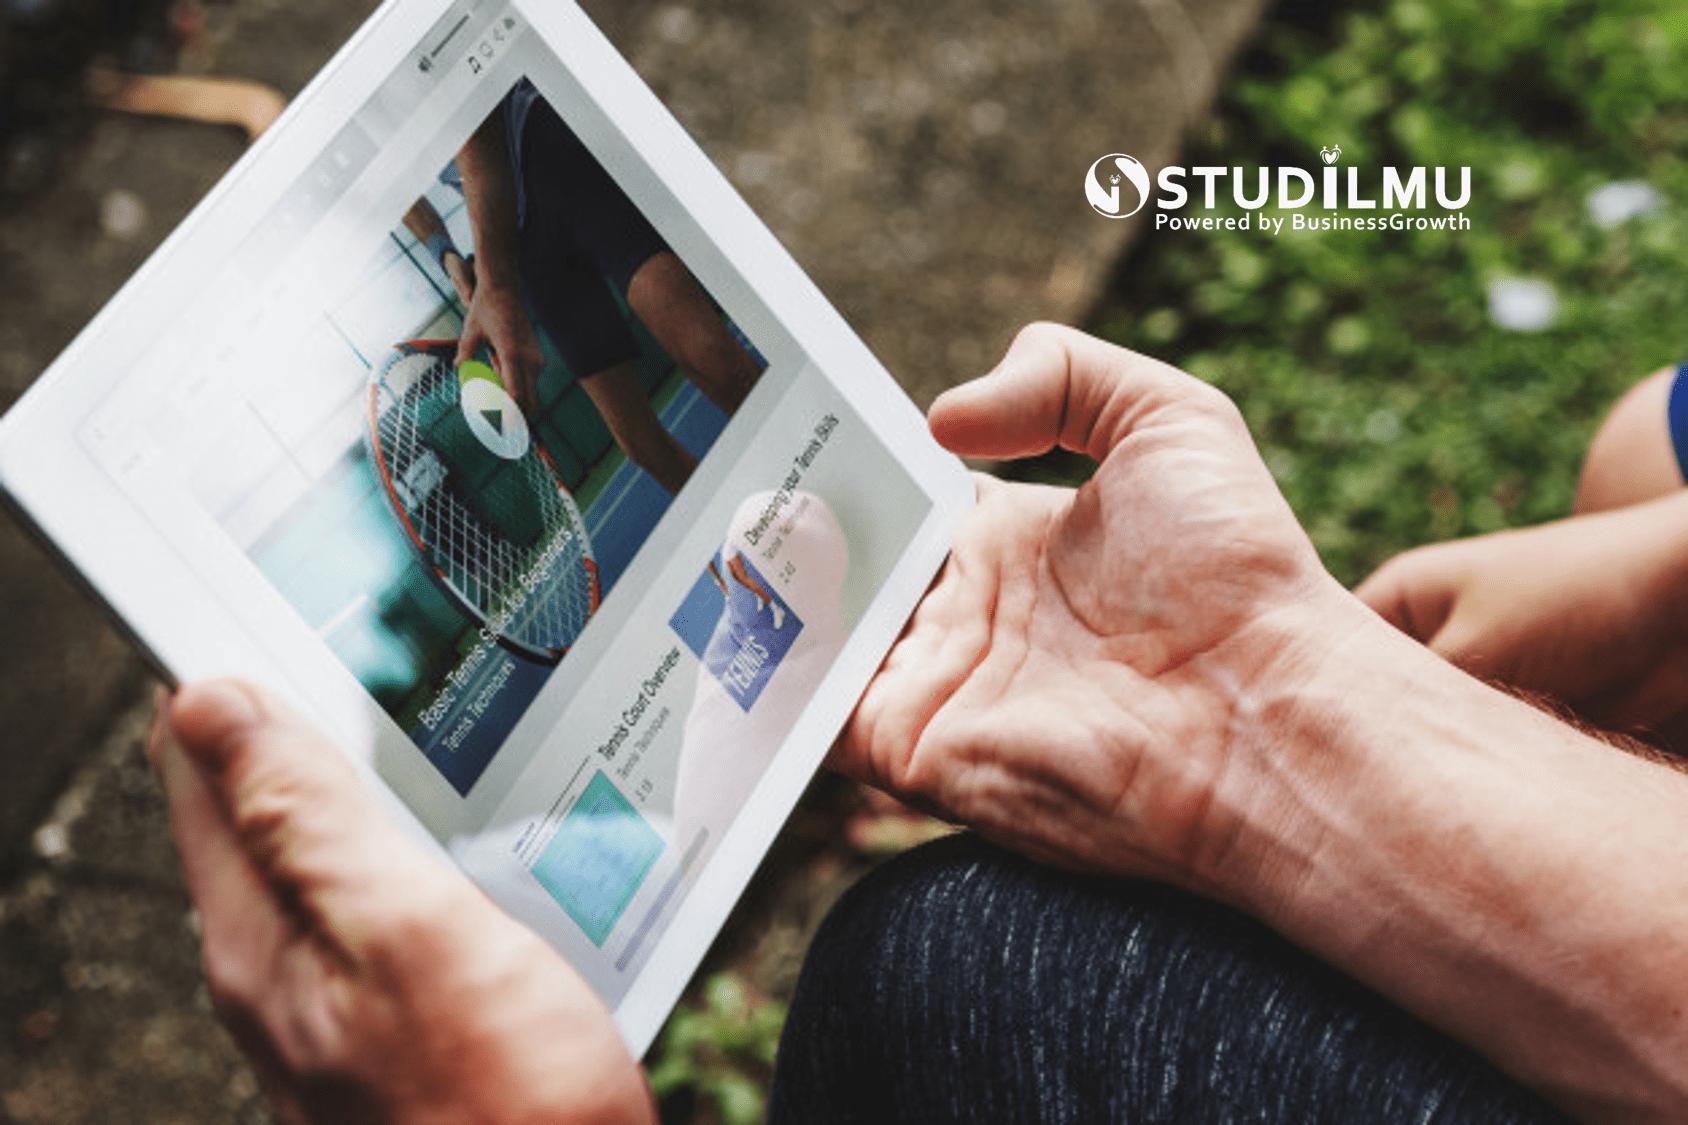 STUDILMU Career Advice - 7 Cara Menggunakan Video sebagai Strategi Pemasaran